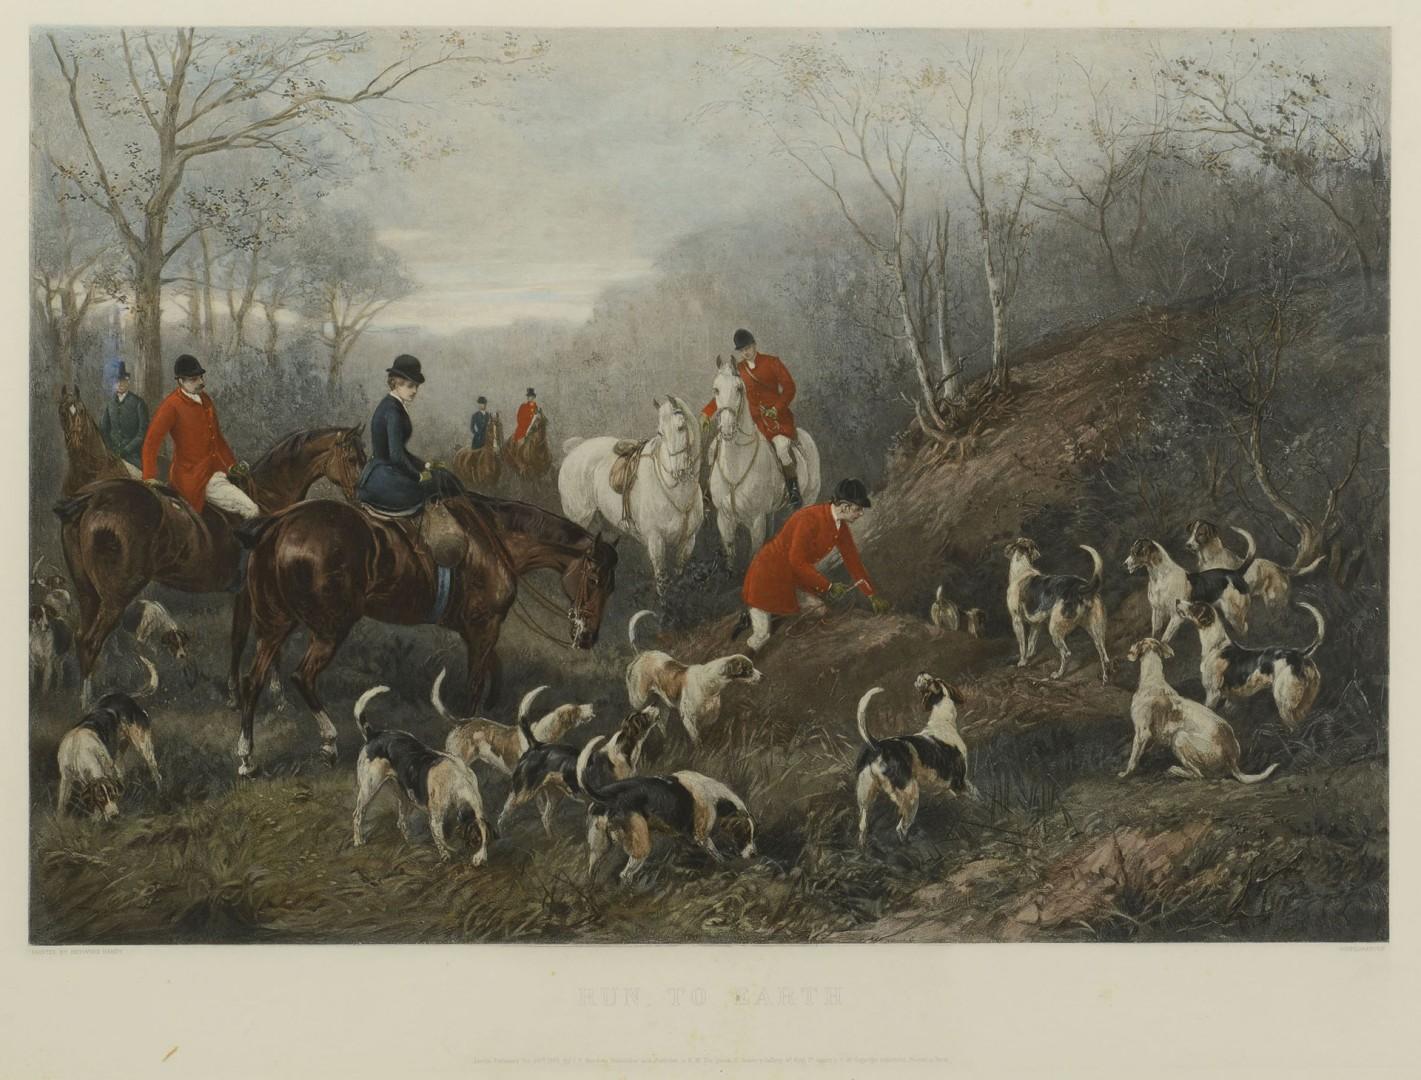 Pair of English Hunting Prints, 19th c.